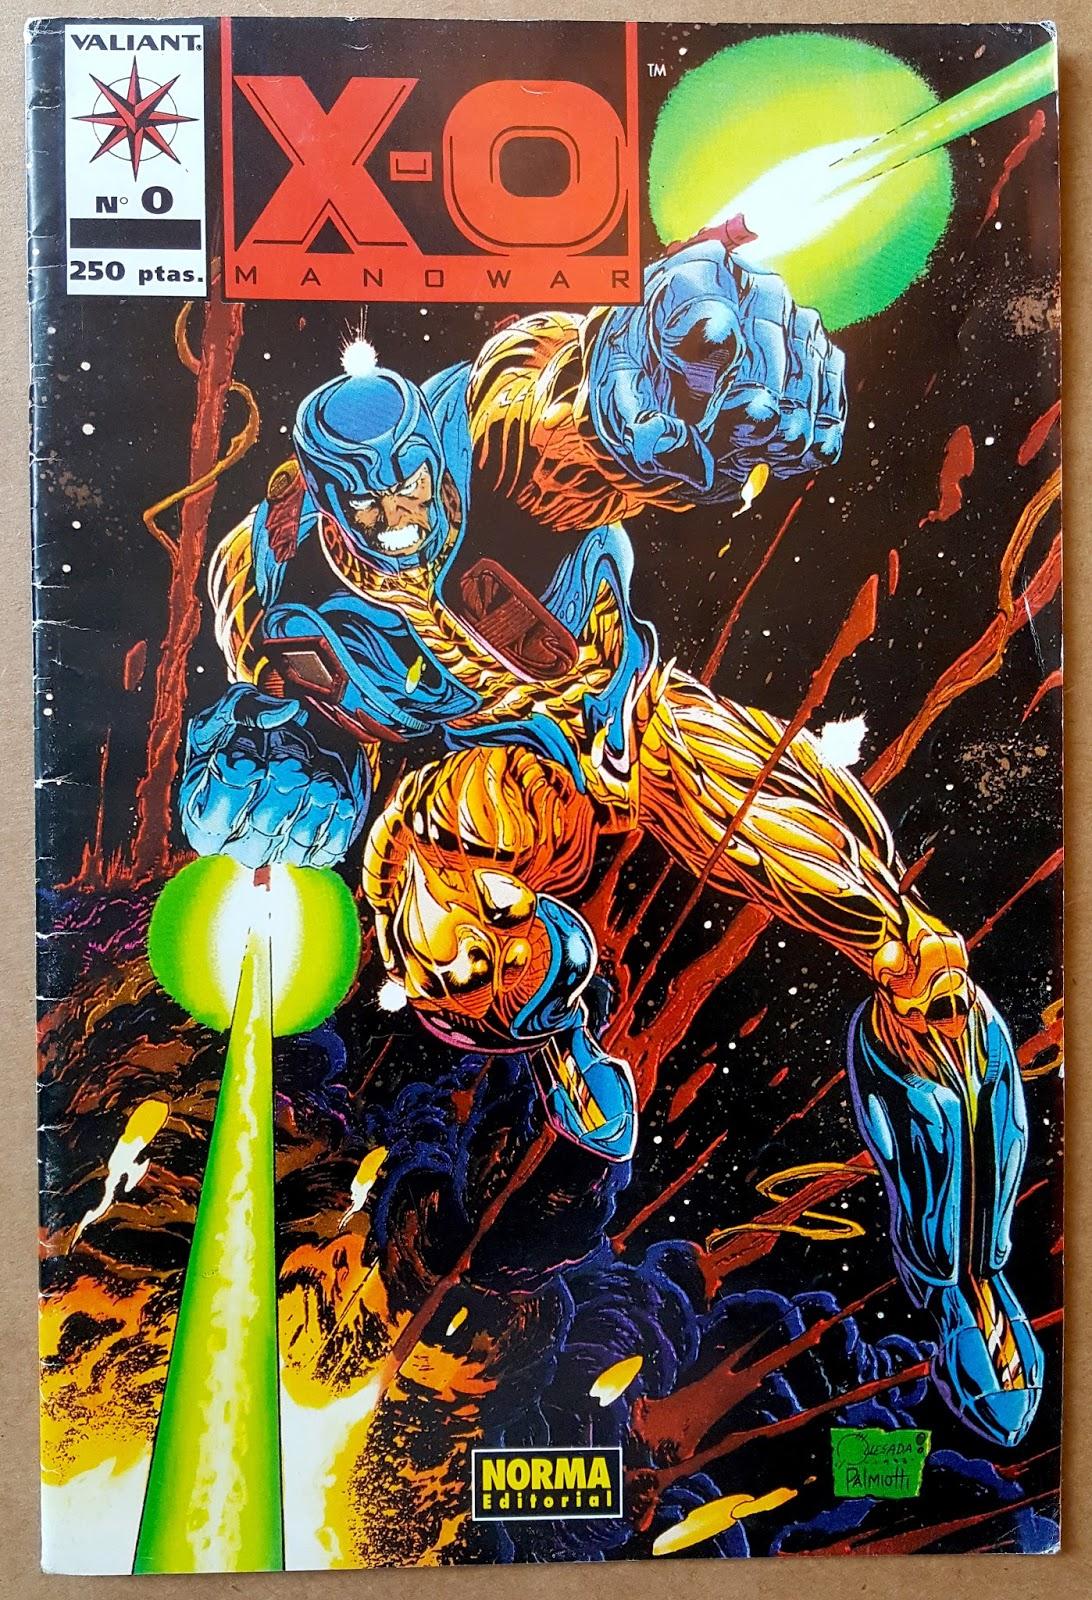 Valiant Bloodshot 6 Comic Book VEI 1st appearance of Ninjak #6